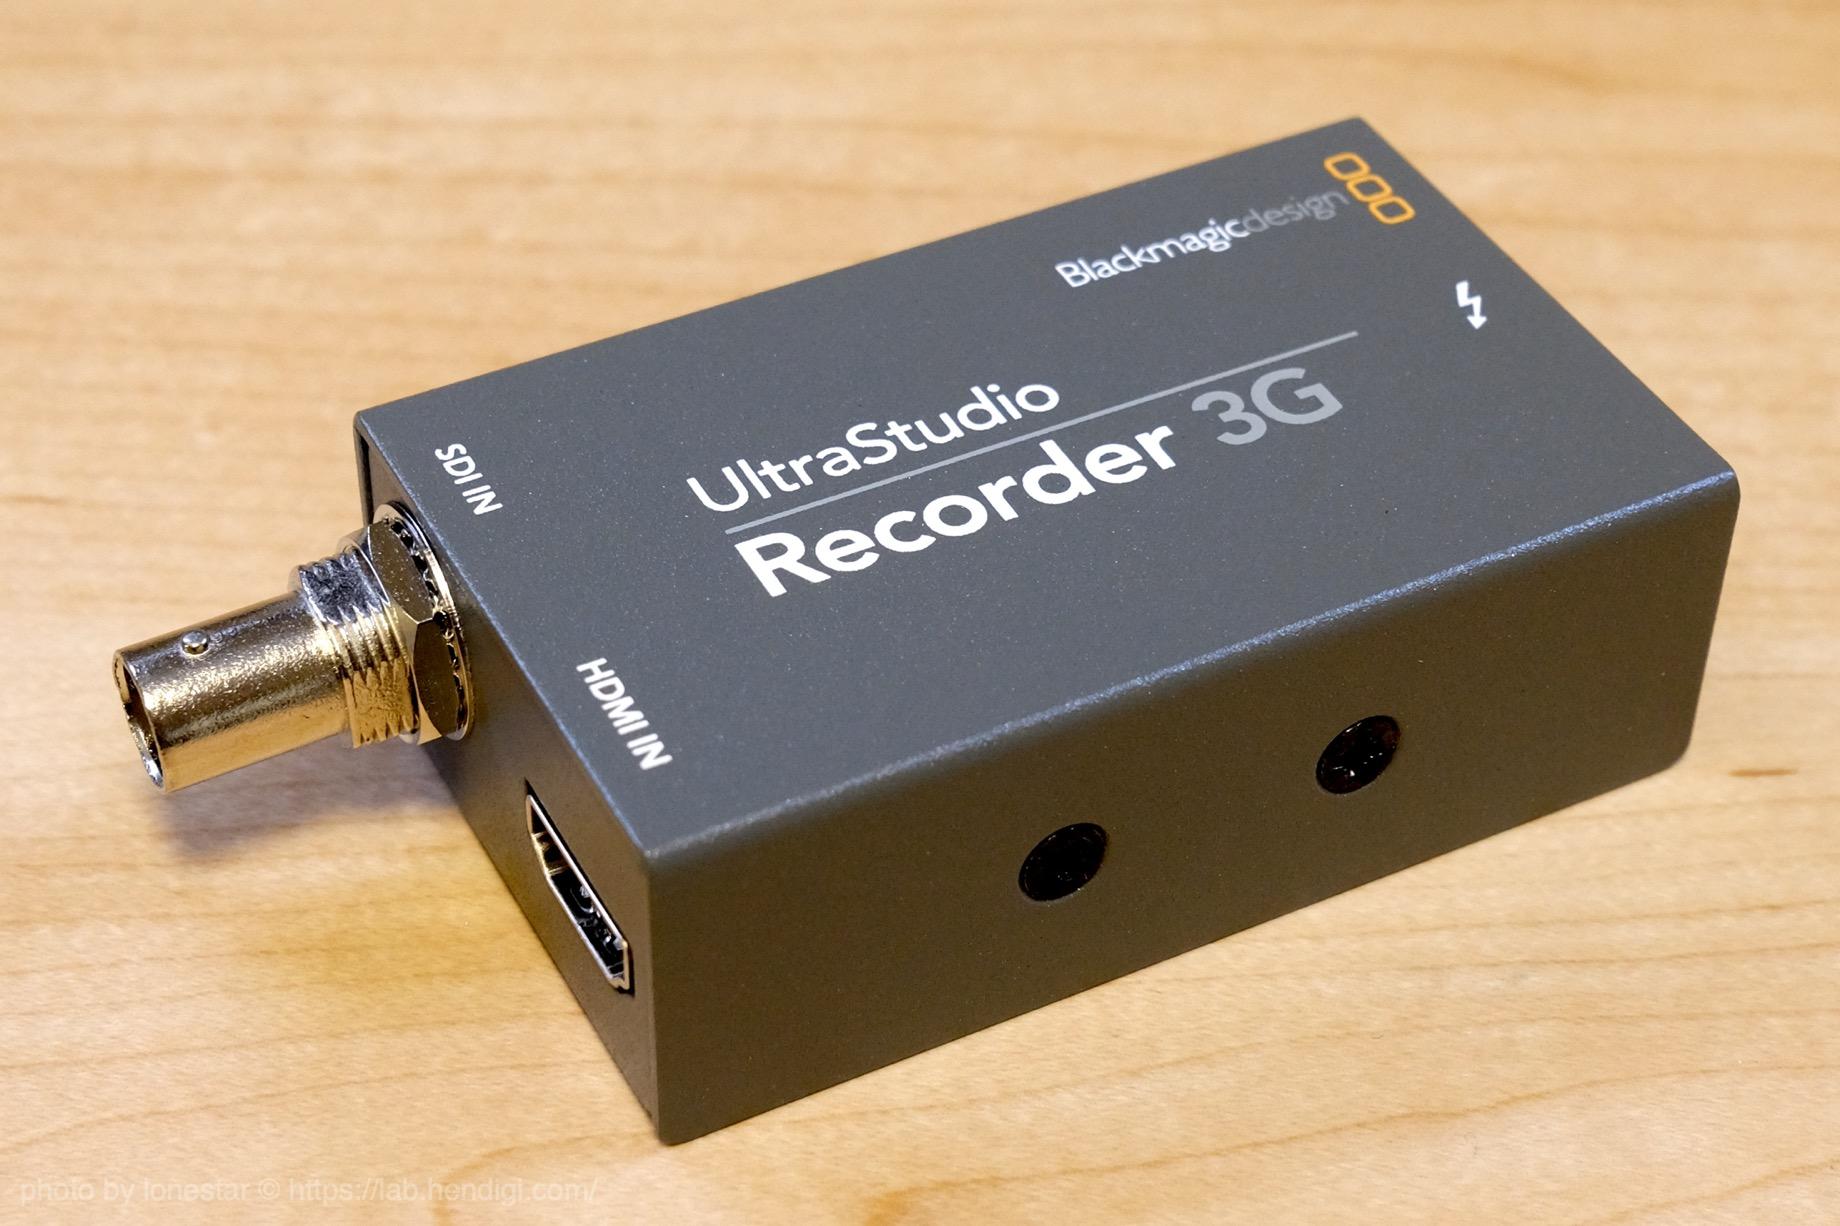 UltraStudio Recorder 3G レビュー